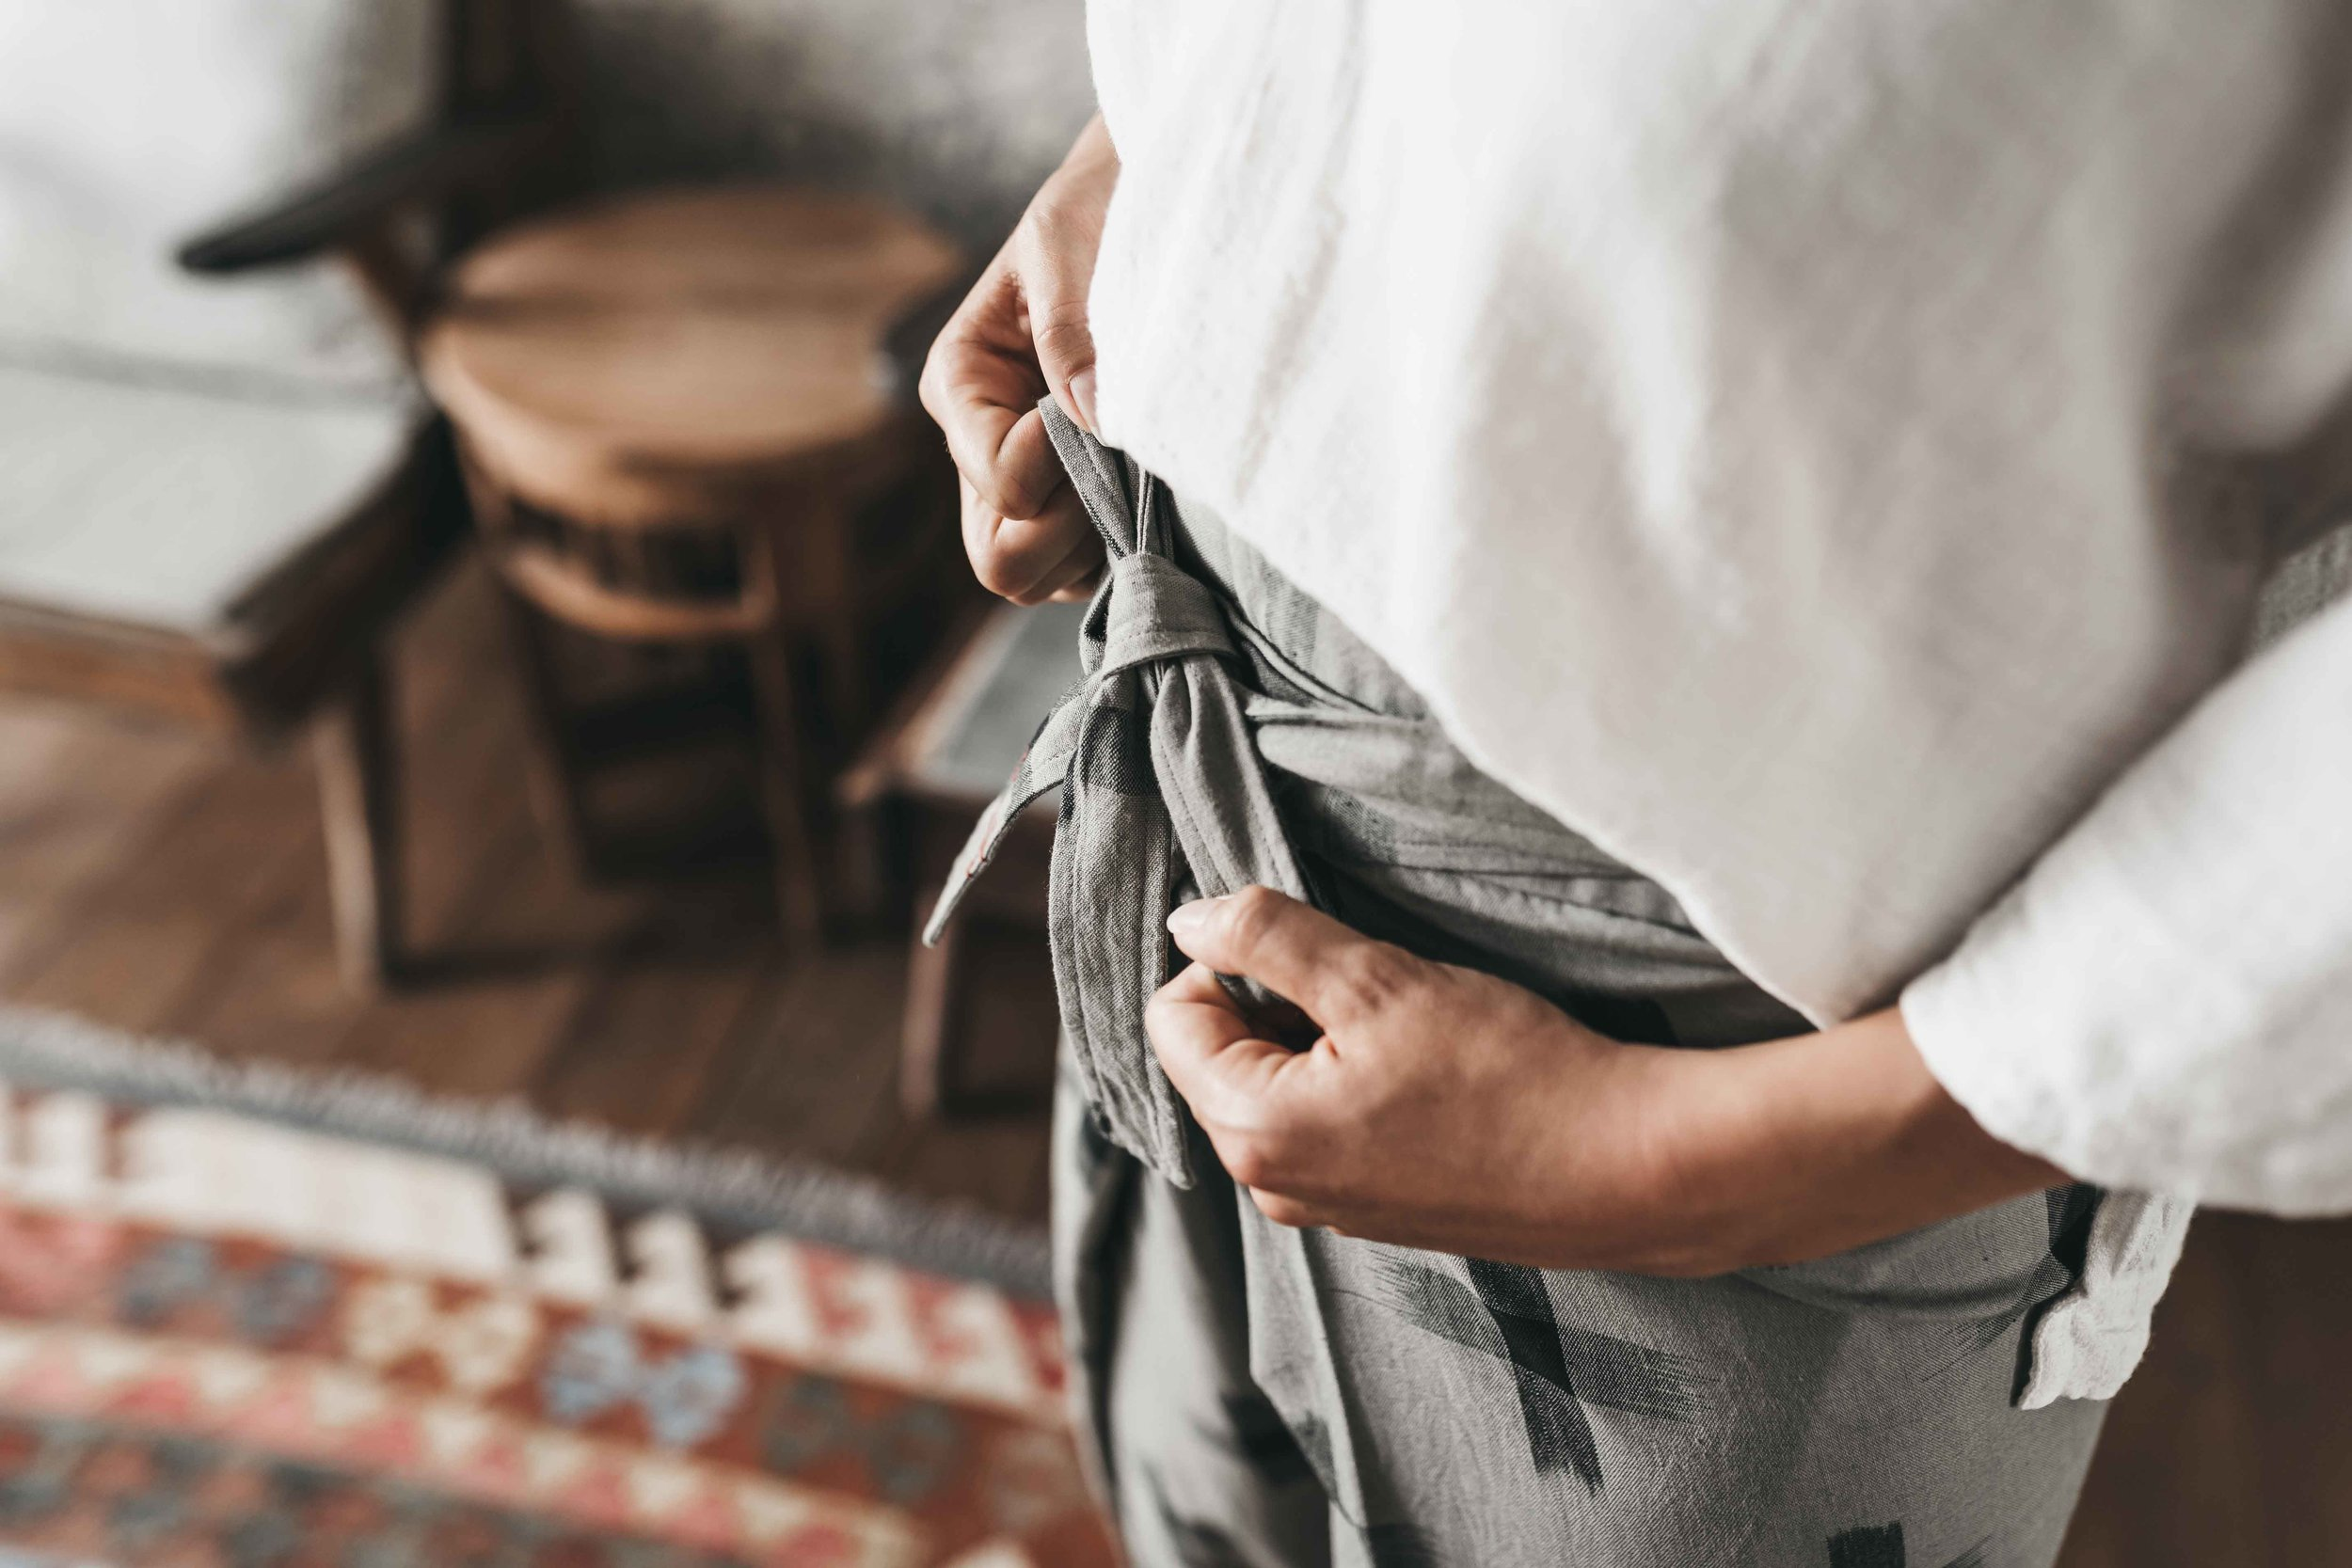 Keira-Mason-Matter-Prints-pants-bow.jpg